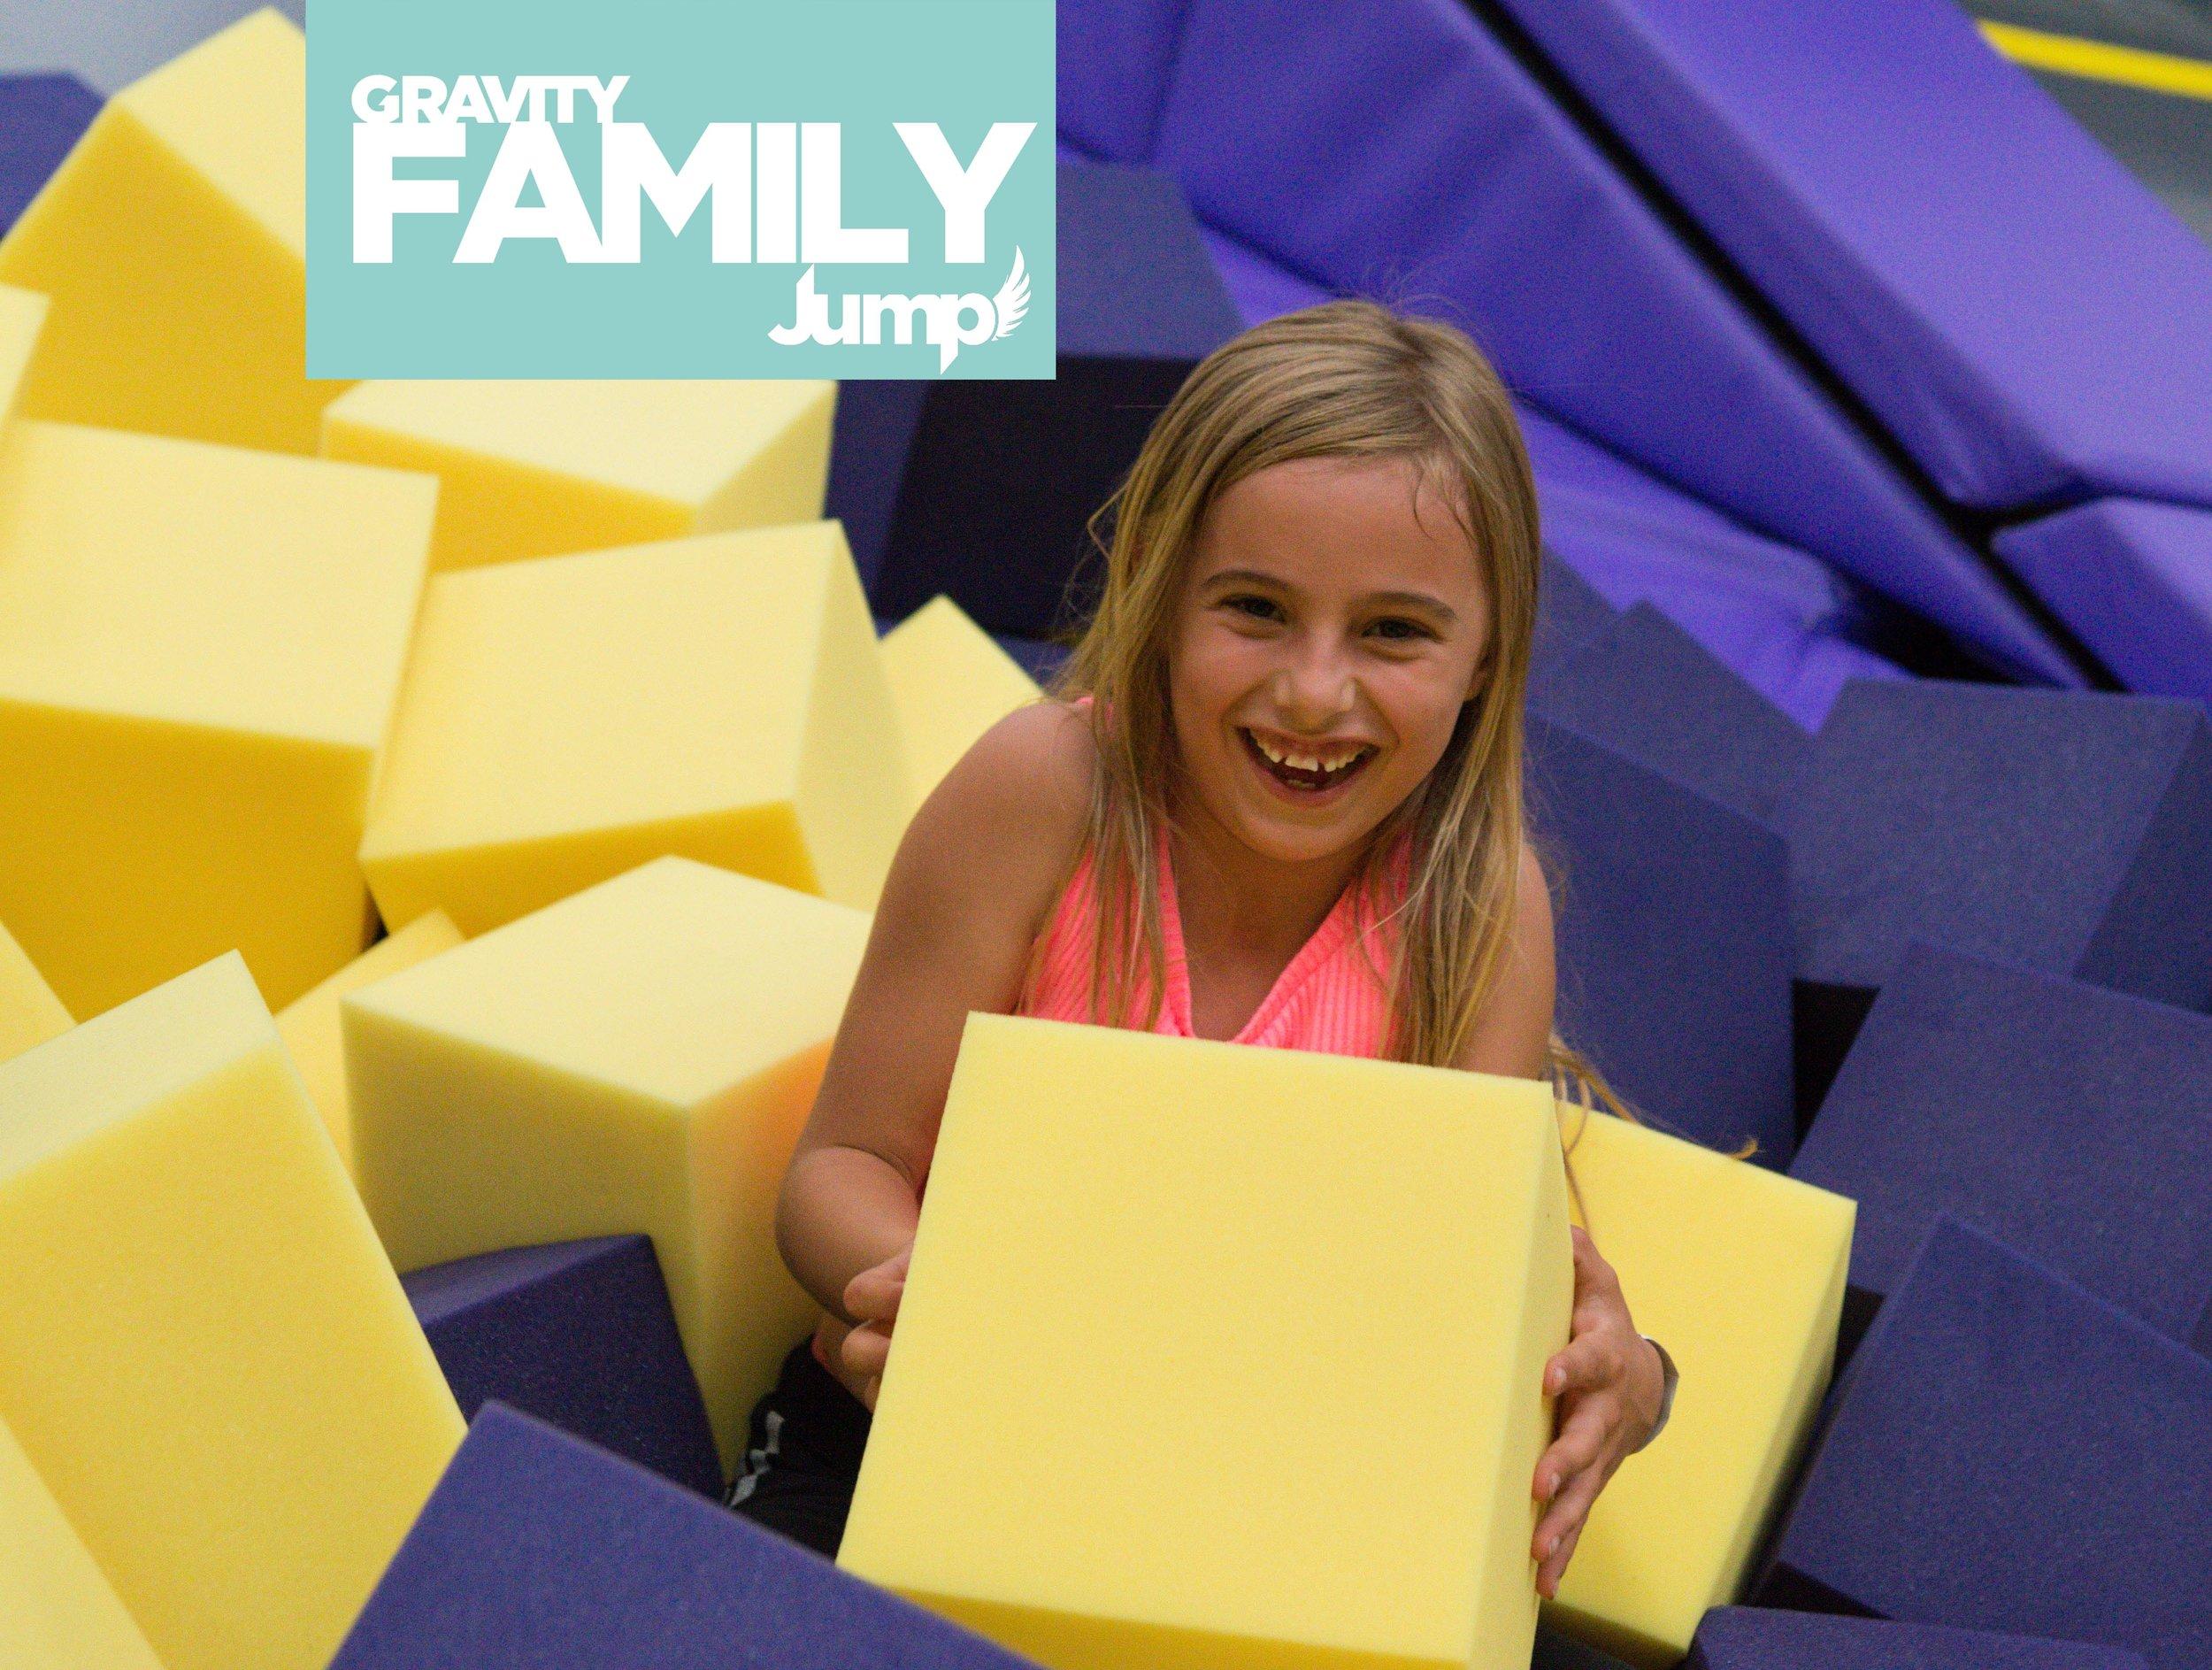 Family fun activities - trampoline park in Camberley